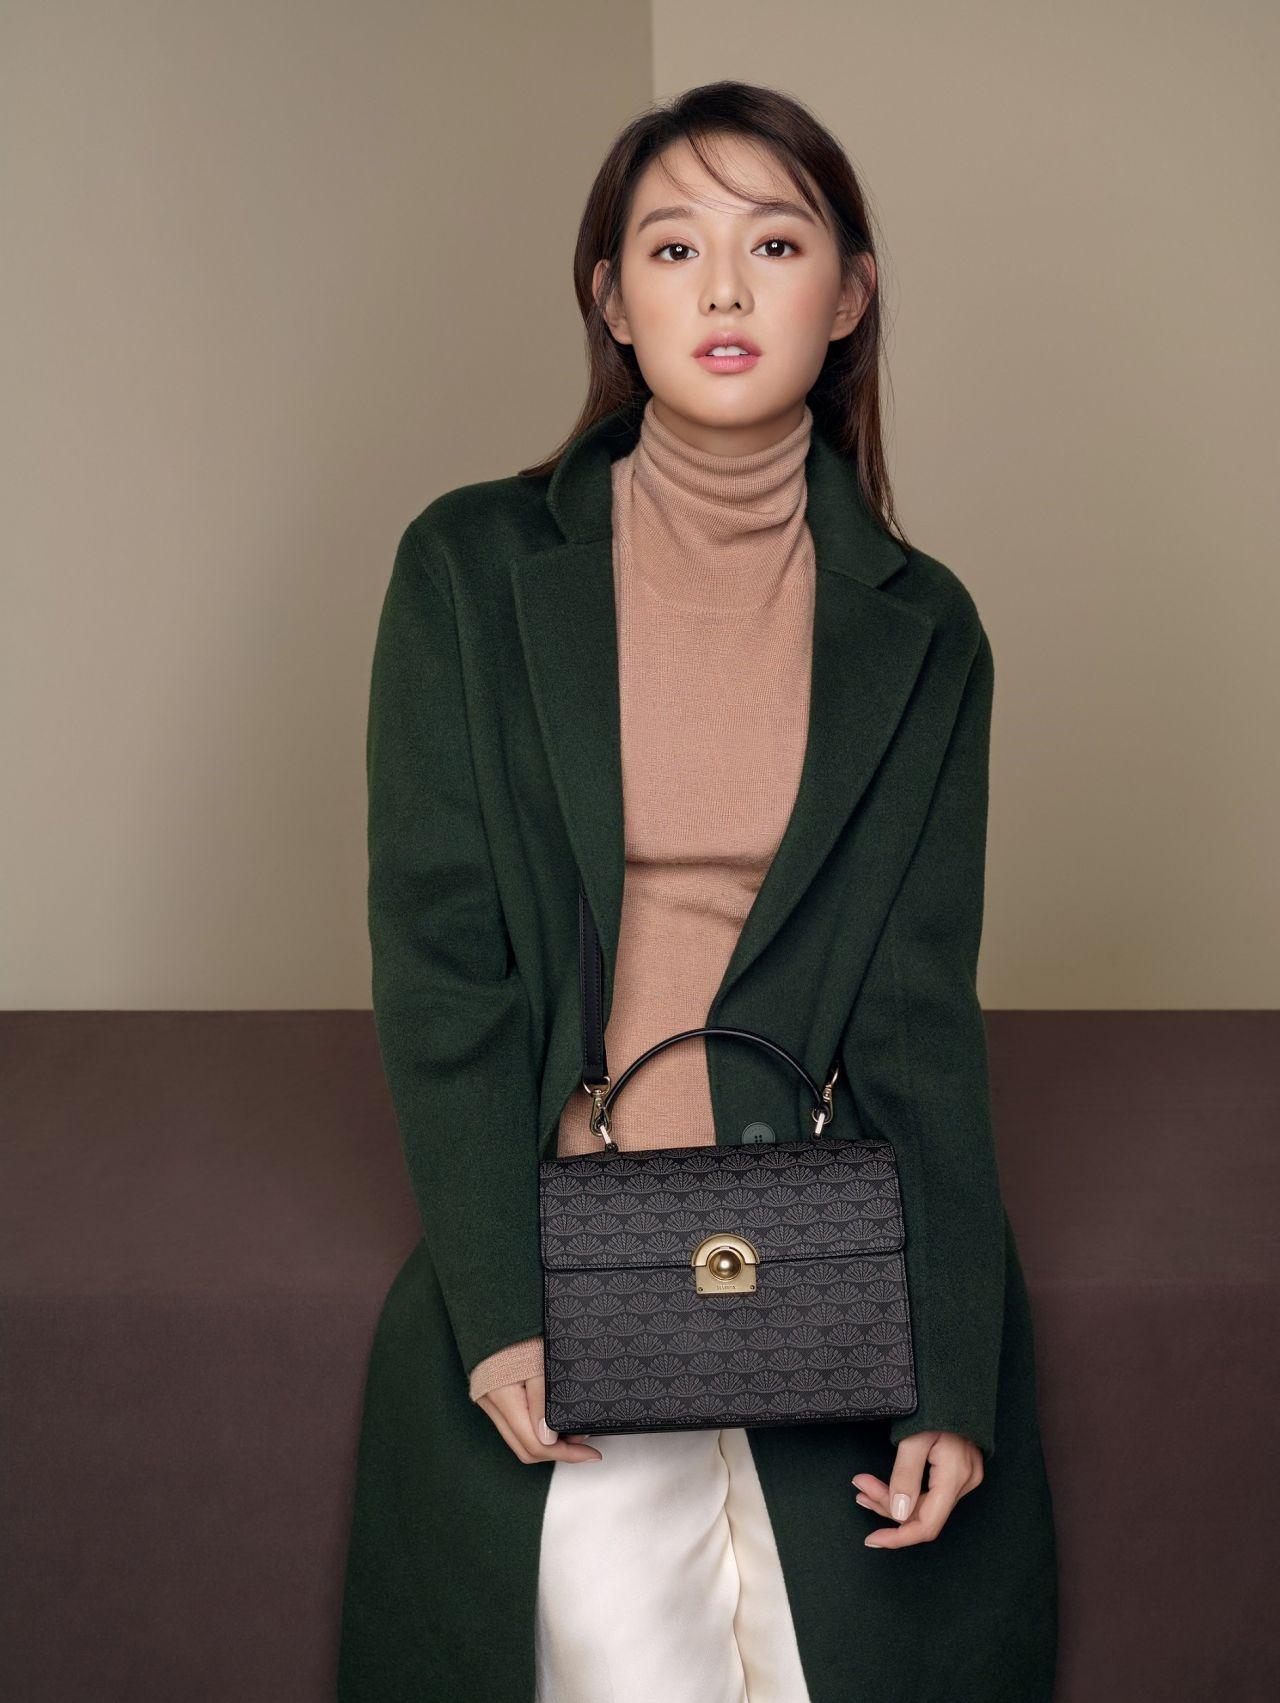 Kim Ji Won - Photoshoot for J.Estina Handbags Fall Winter 2017